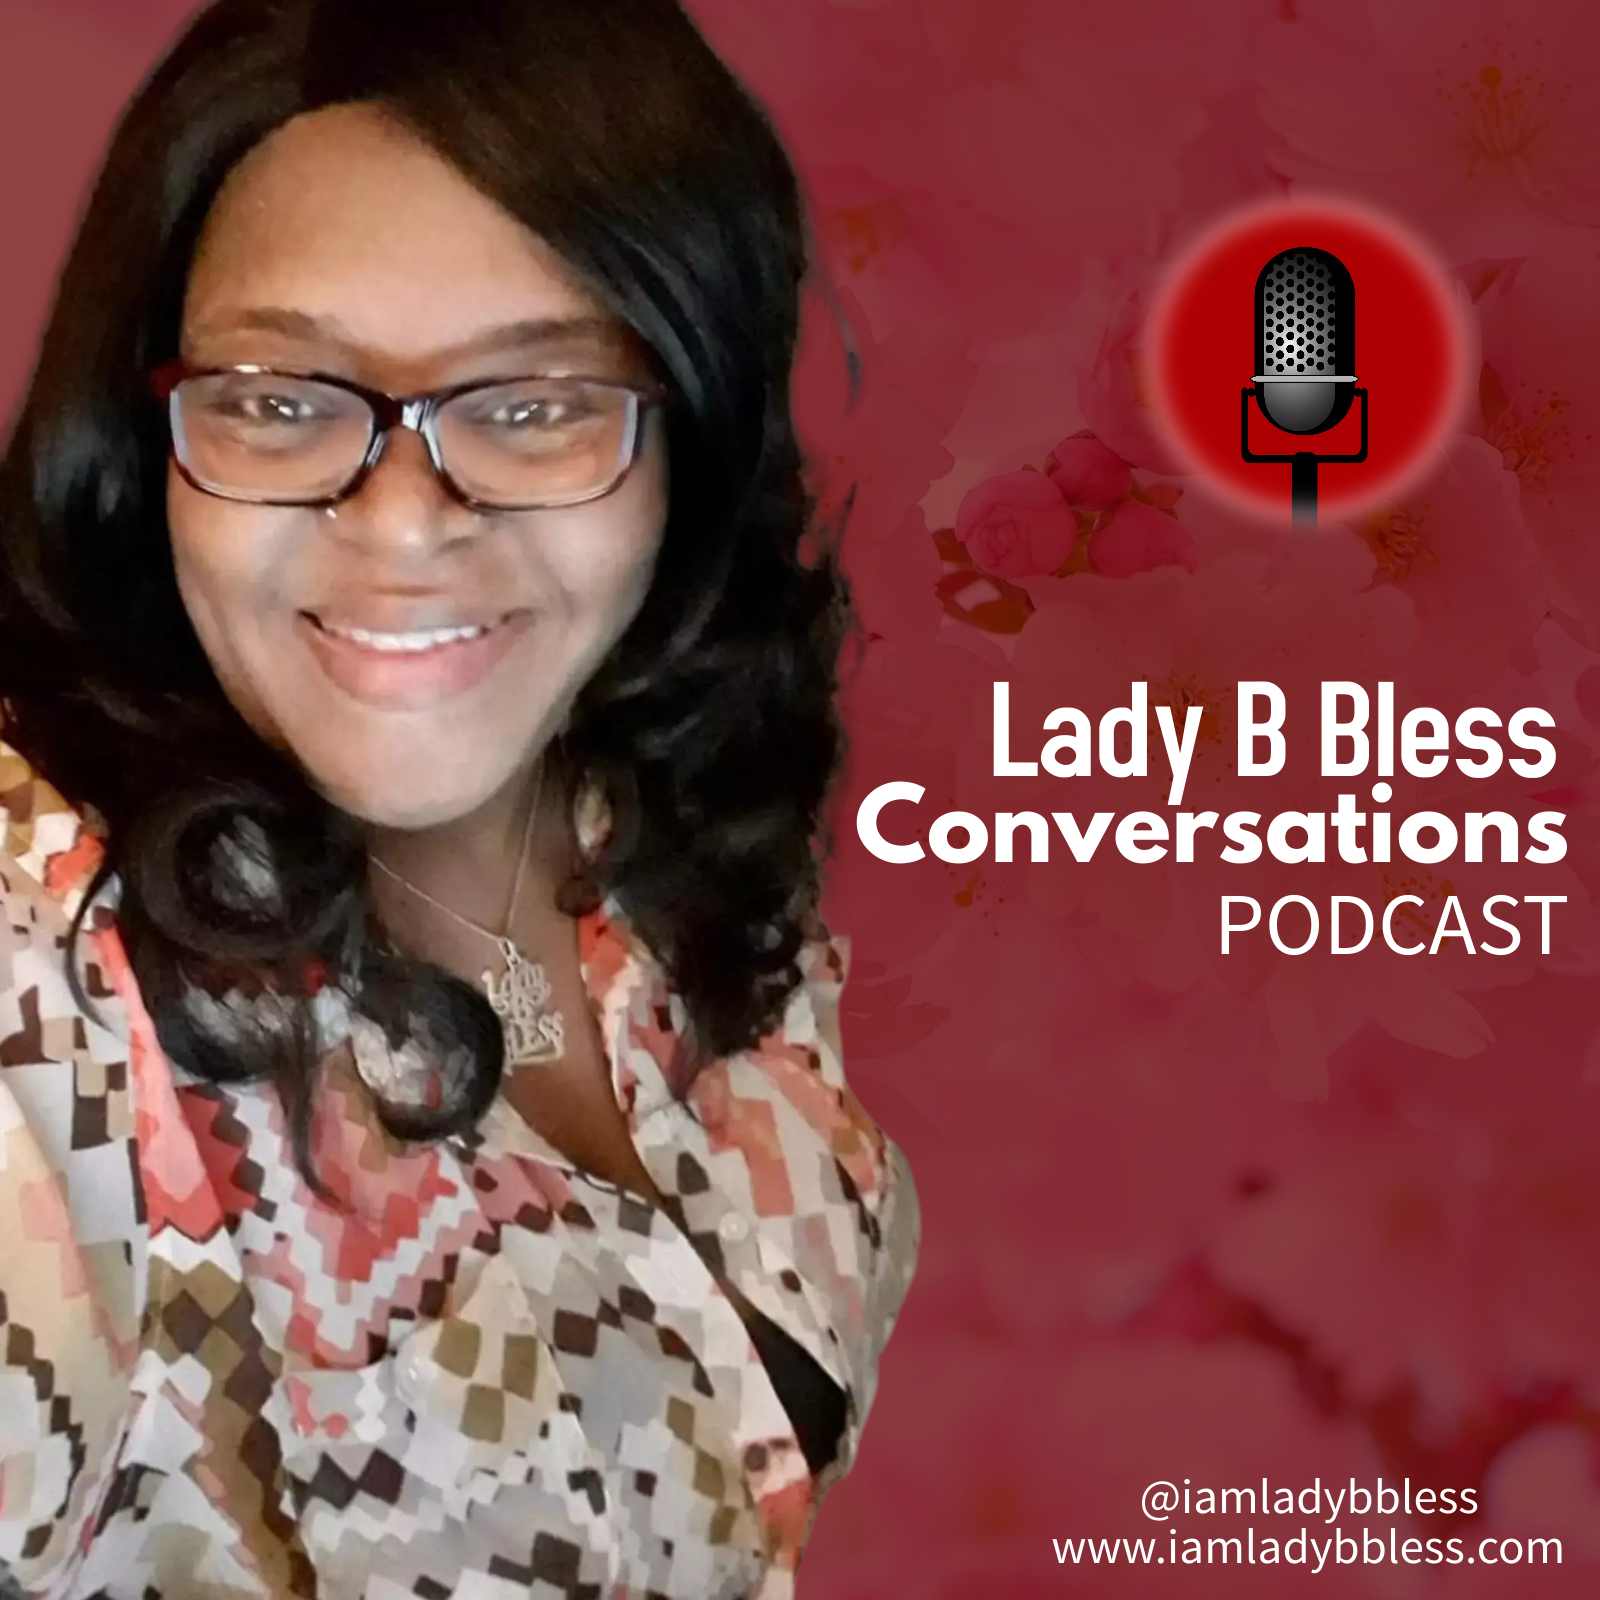 Lady B Bless Conversations Podcast Logo